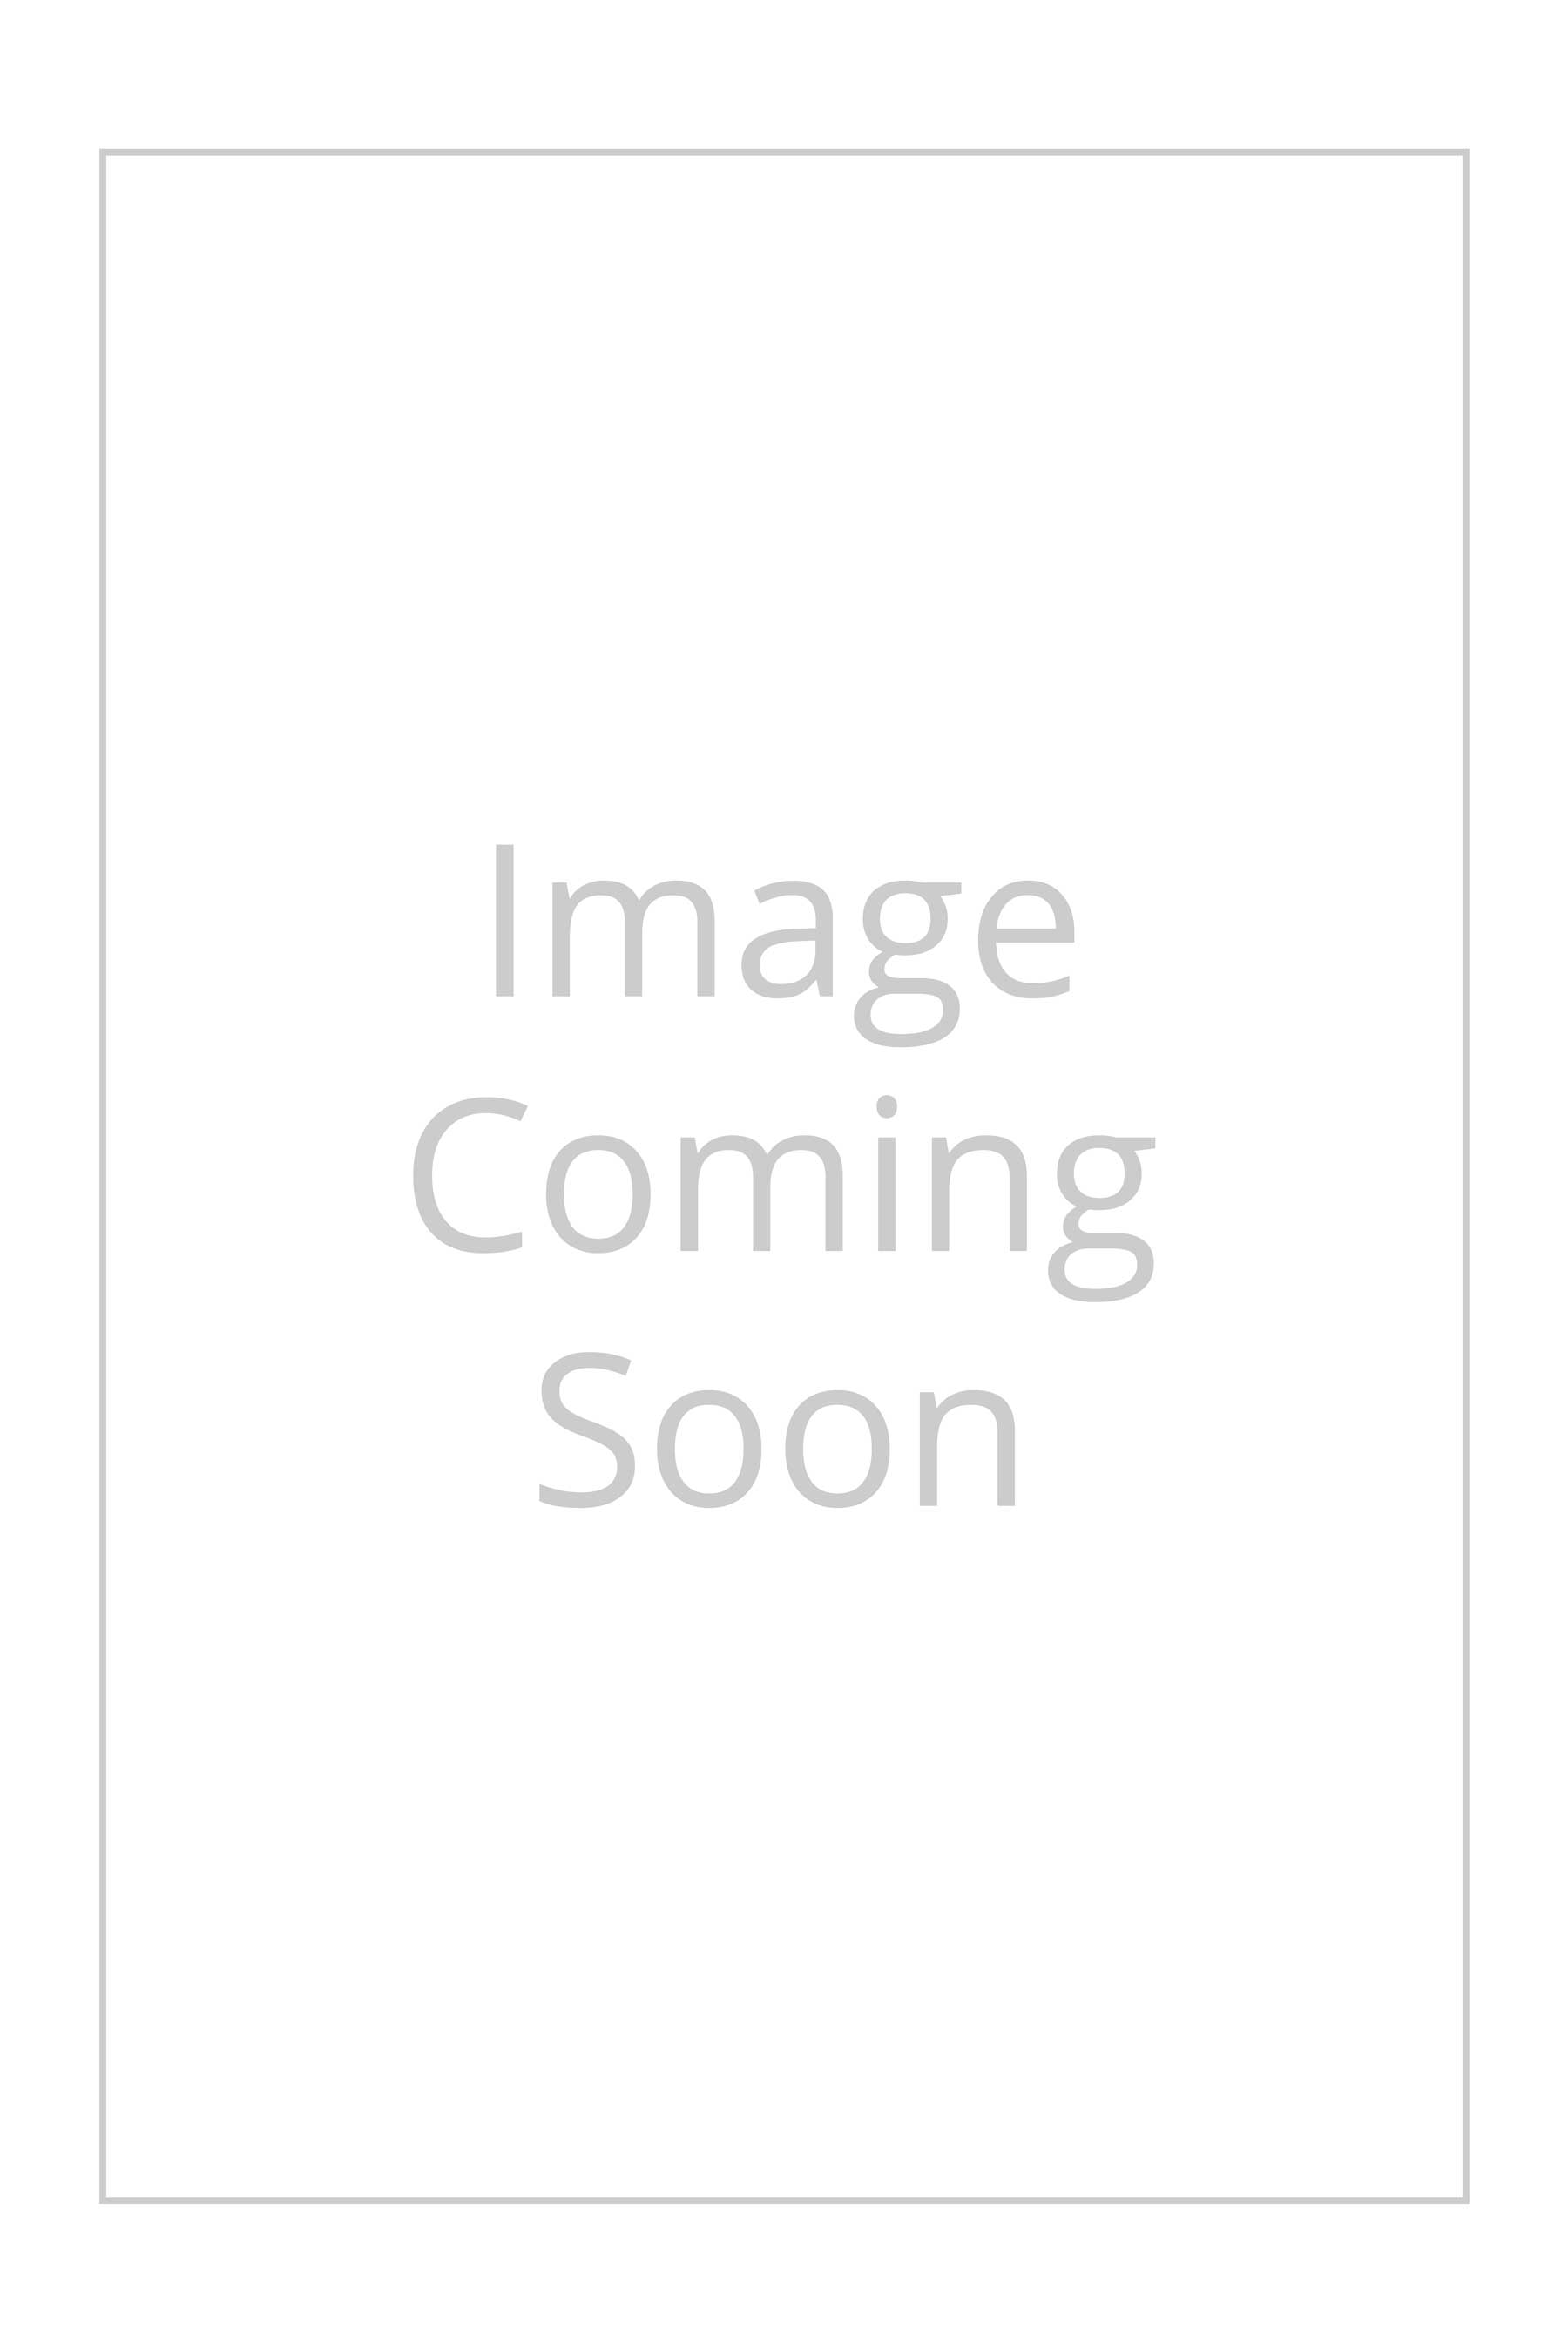 Ralph Lauren Black Label Convertible Silk Cashmere Turtleneck in Ivory